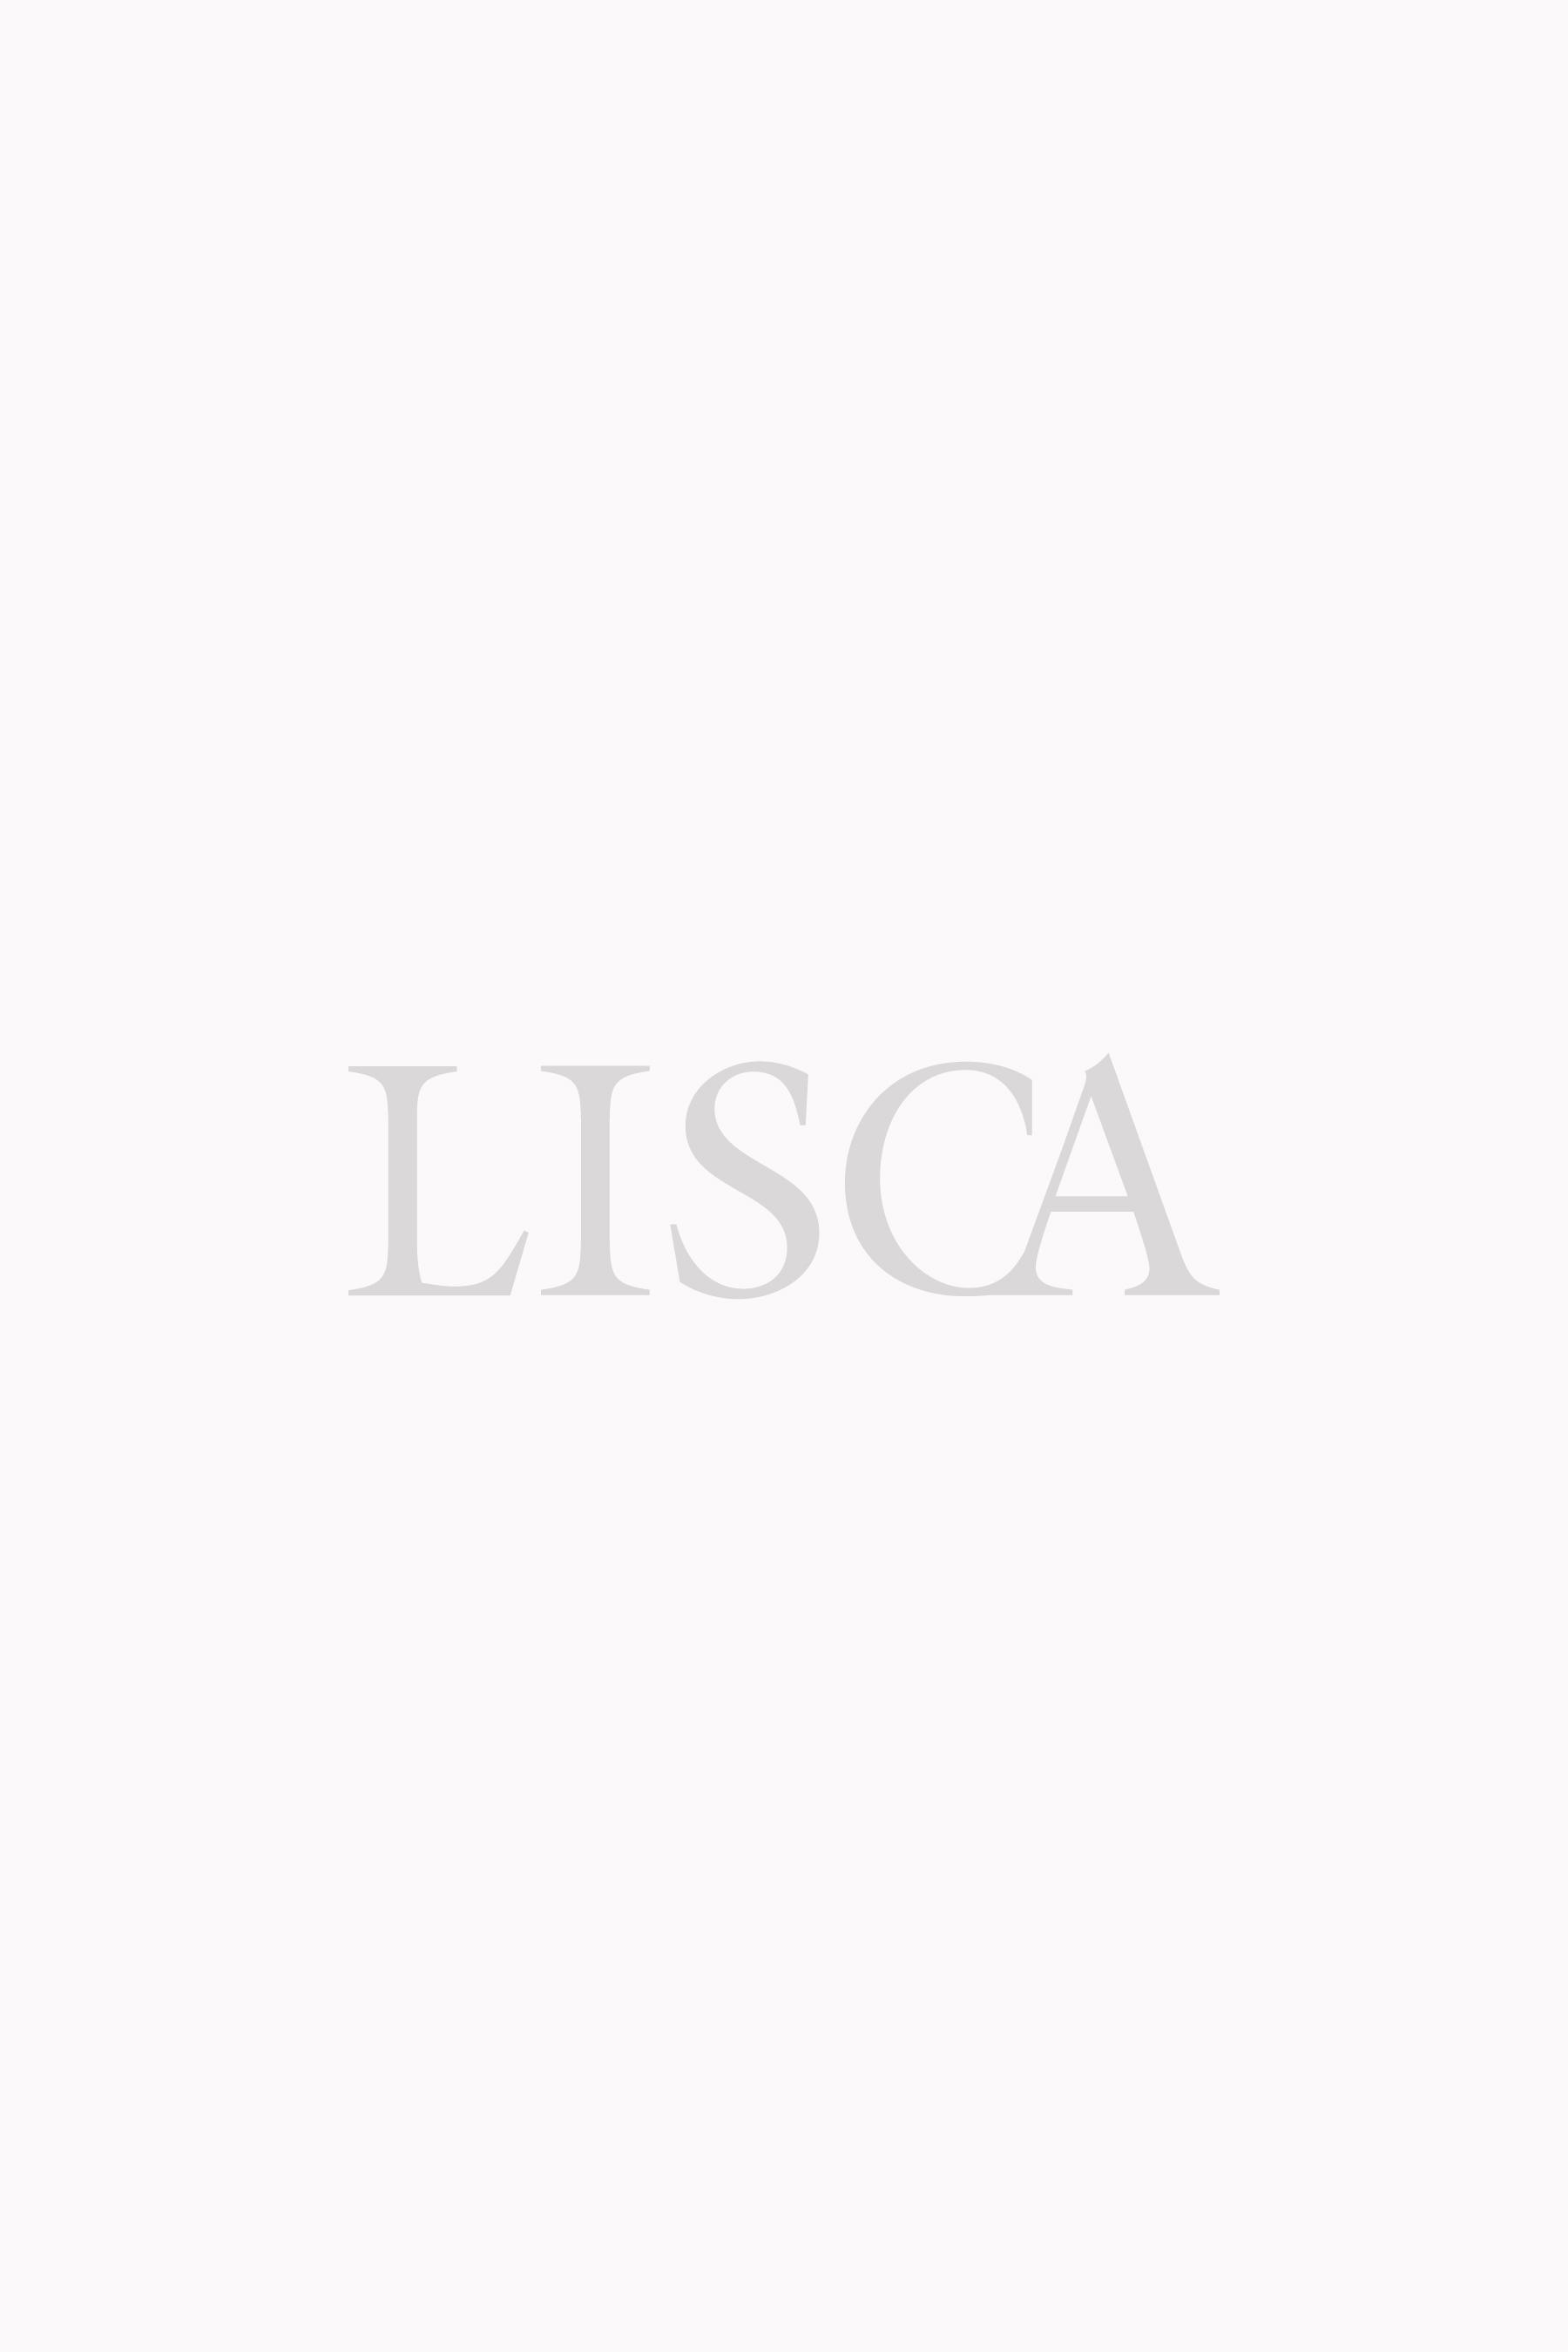 Revija Lisca, jesen-zima 2013